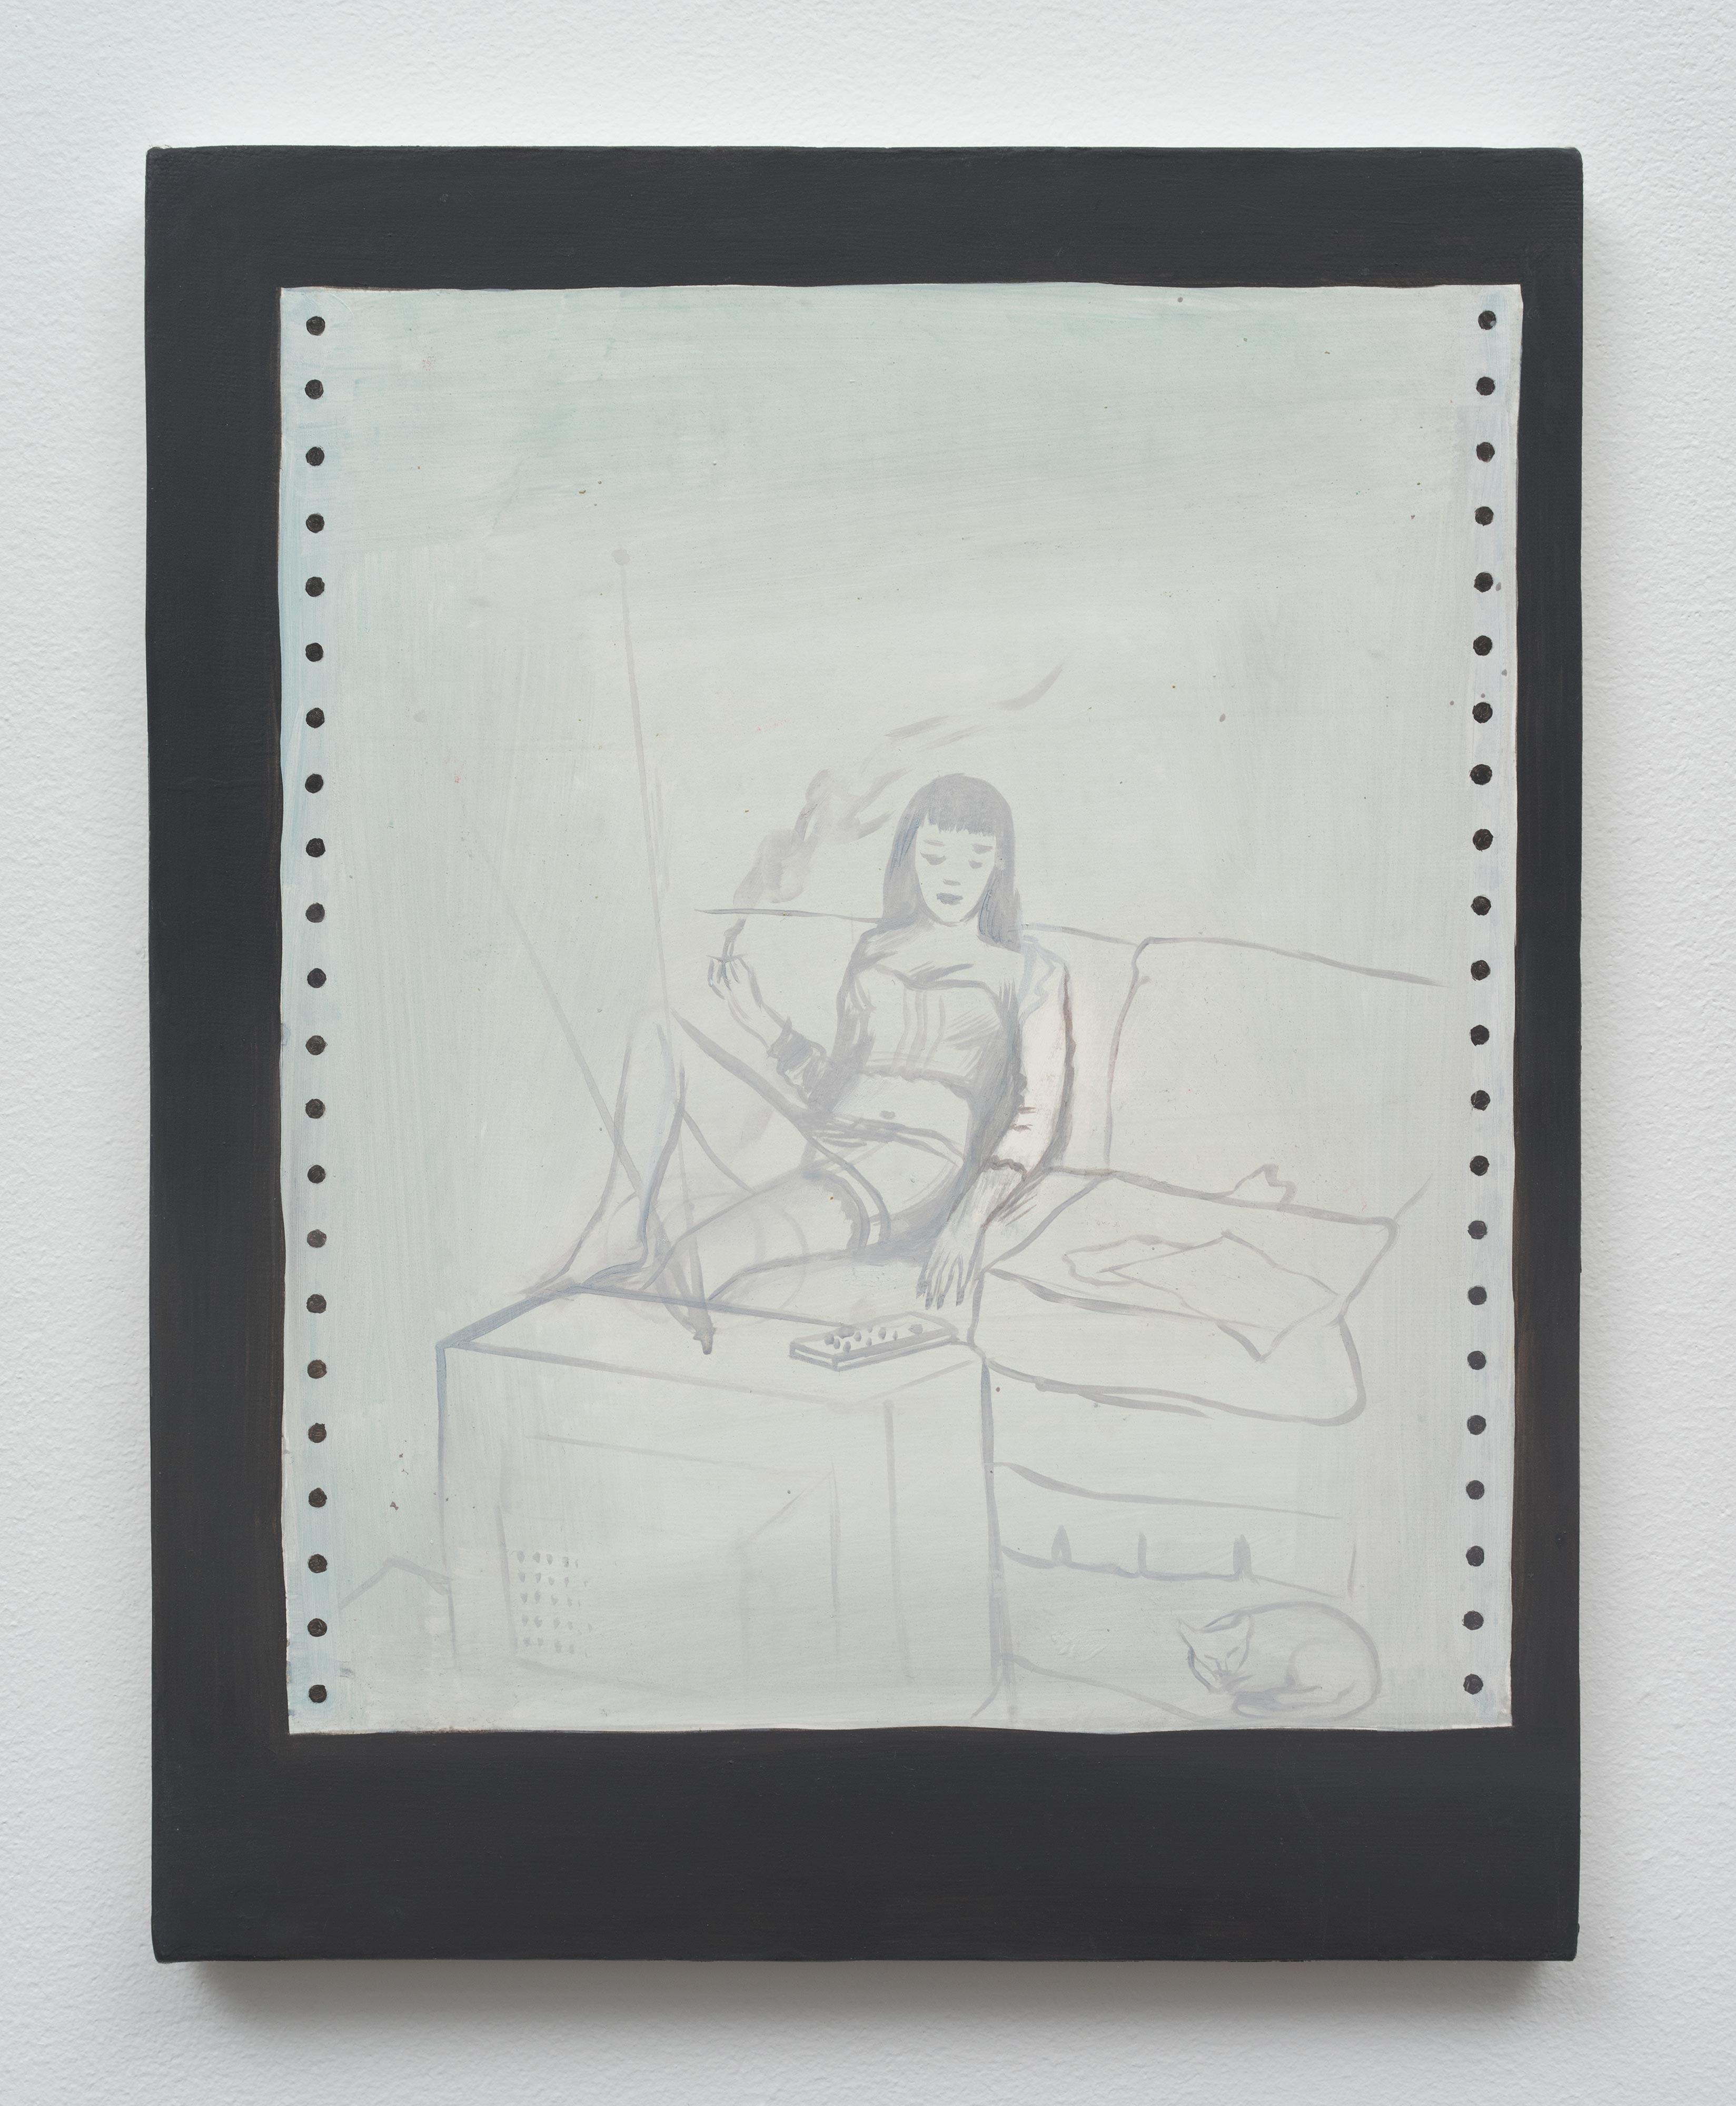 Brandi Twilley<br>Watching TV<br>2014<br>oil on canvas<br>14 x 11 in (35.56 x 27.94 cm)